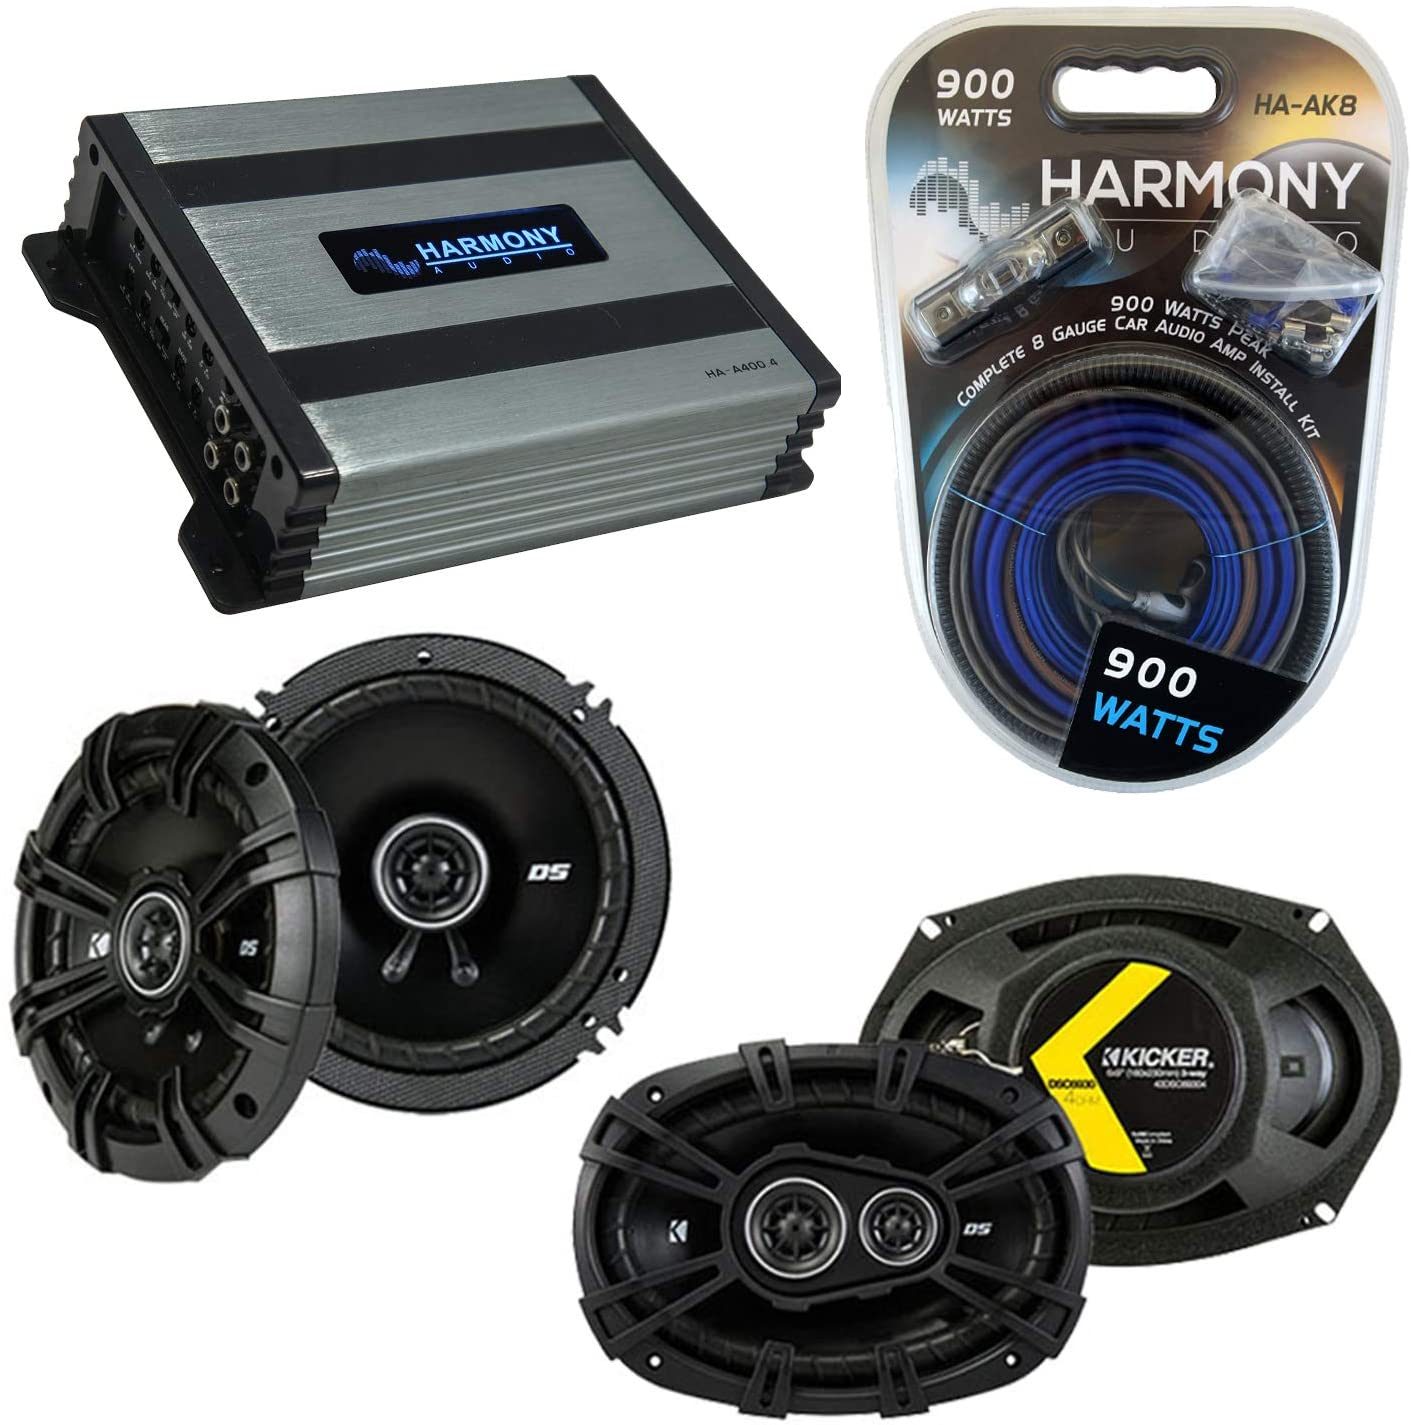 Compatible with Jeep Commander 08-10 Speaker Replacement Kicker Bundle DSC693 DSC65 & Harmony HA-A400.4 Amp